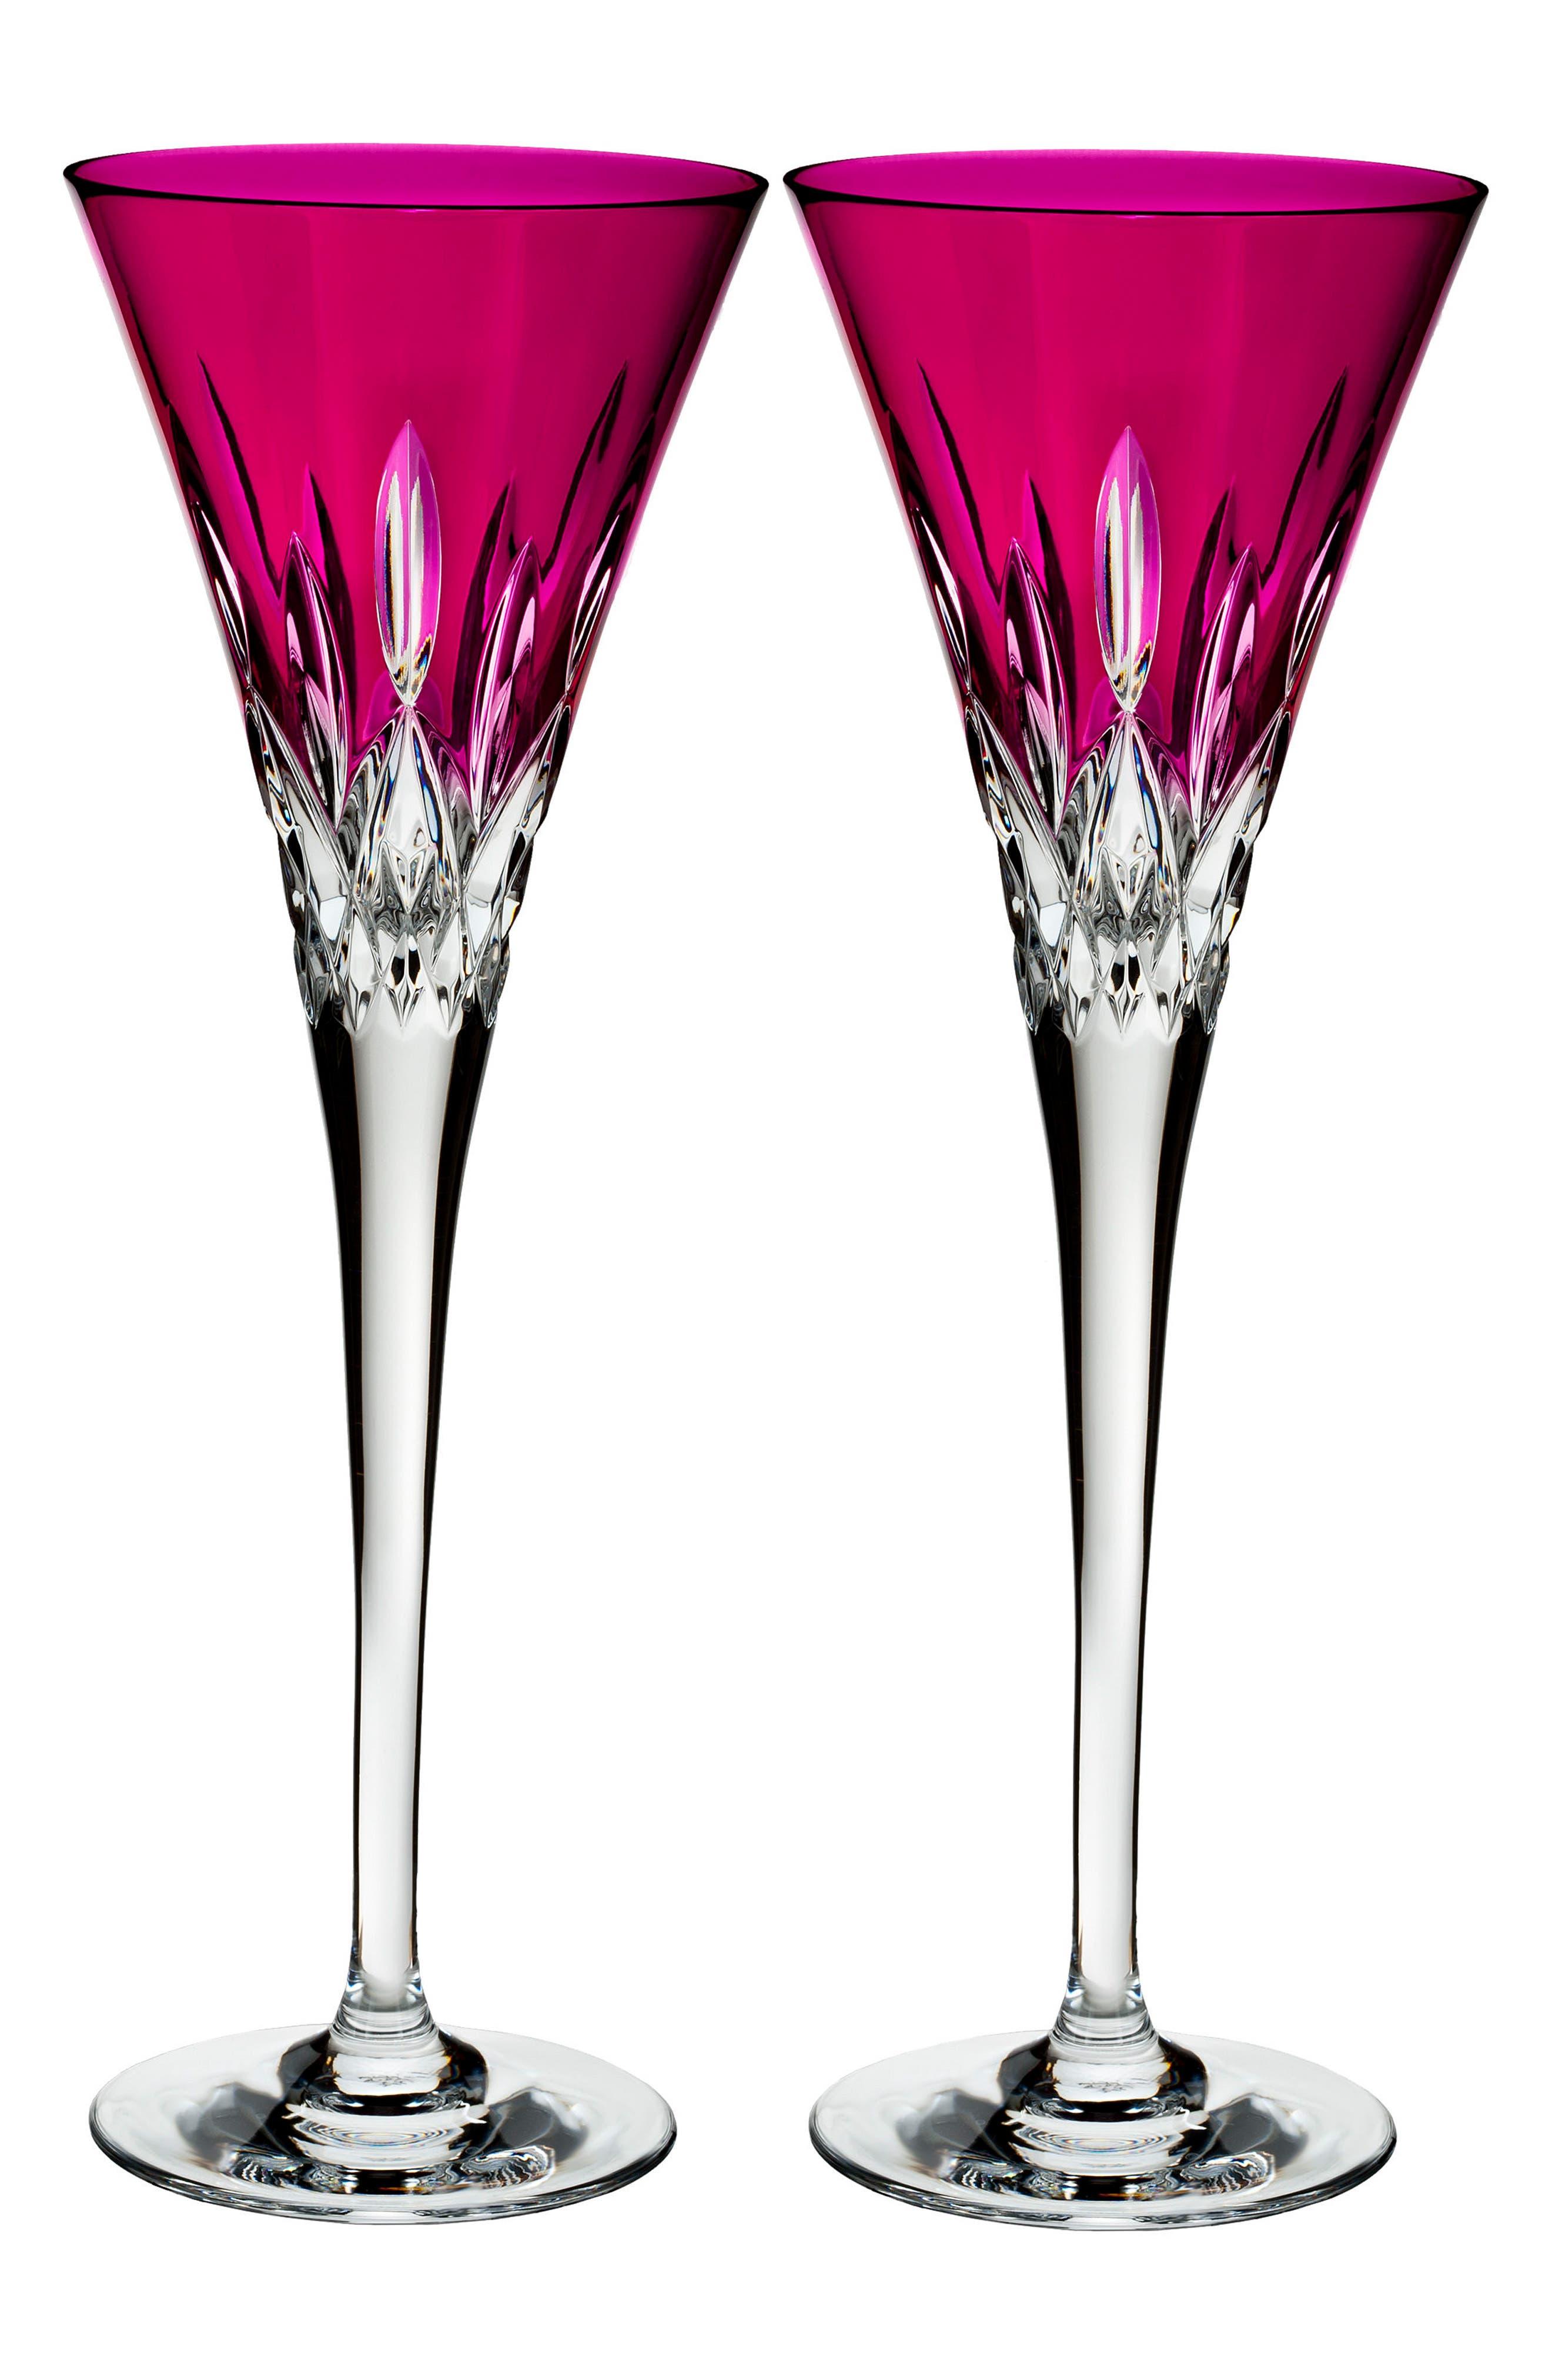 Lismore Pops Set of 2 Hot Pink Lead Crystal Champagne Flutes,                             Main thumbnail 1, color,                             Crystal